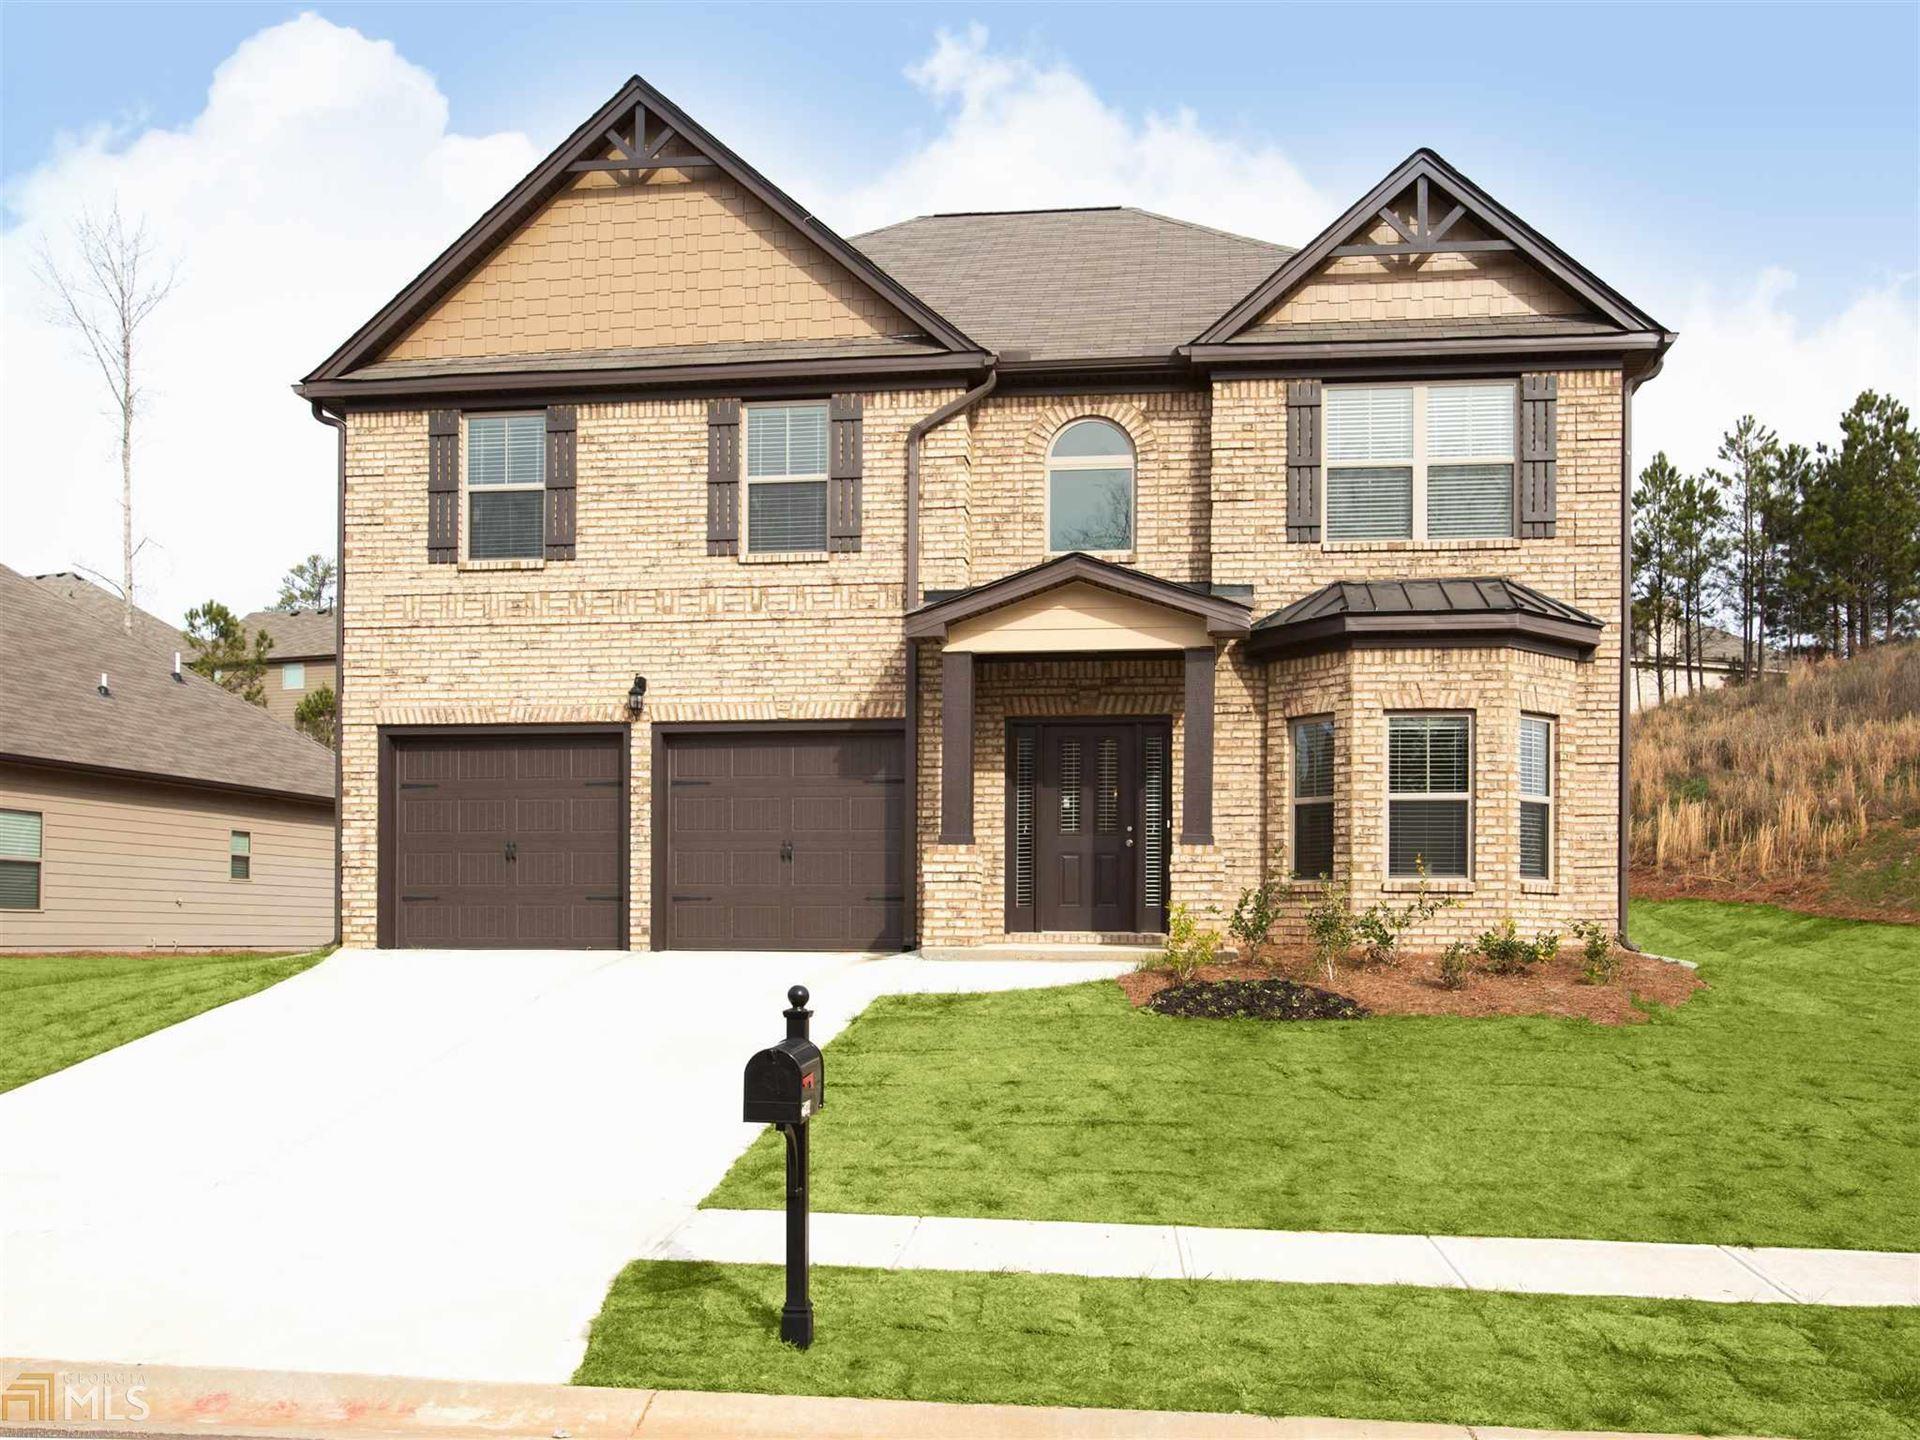 2875 Ridge Manor Dr, Dacula, GA 30019 - MLS#: 8899113